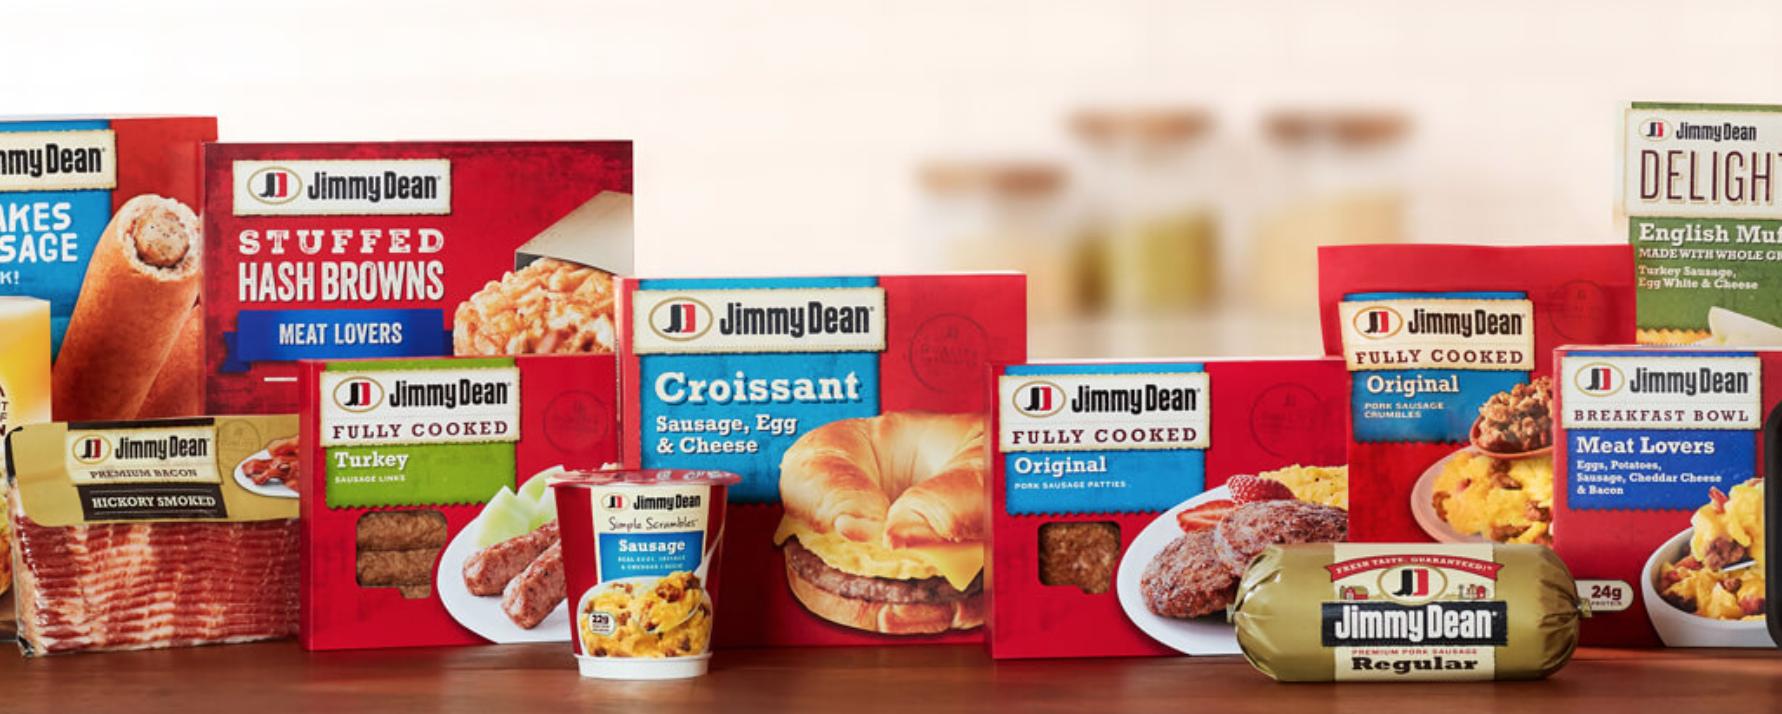 NEW Jimmy Dean Coupon makes for $.25-$2.19 items at Family Dollar, Dollar Tree, Walmart, Tops & Wegmans!!